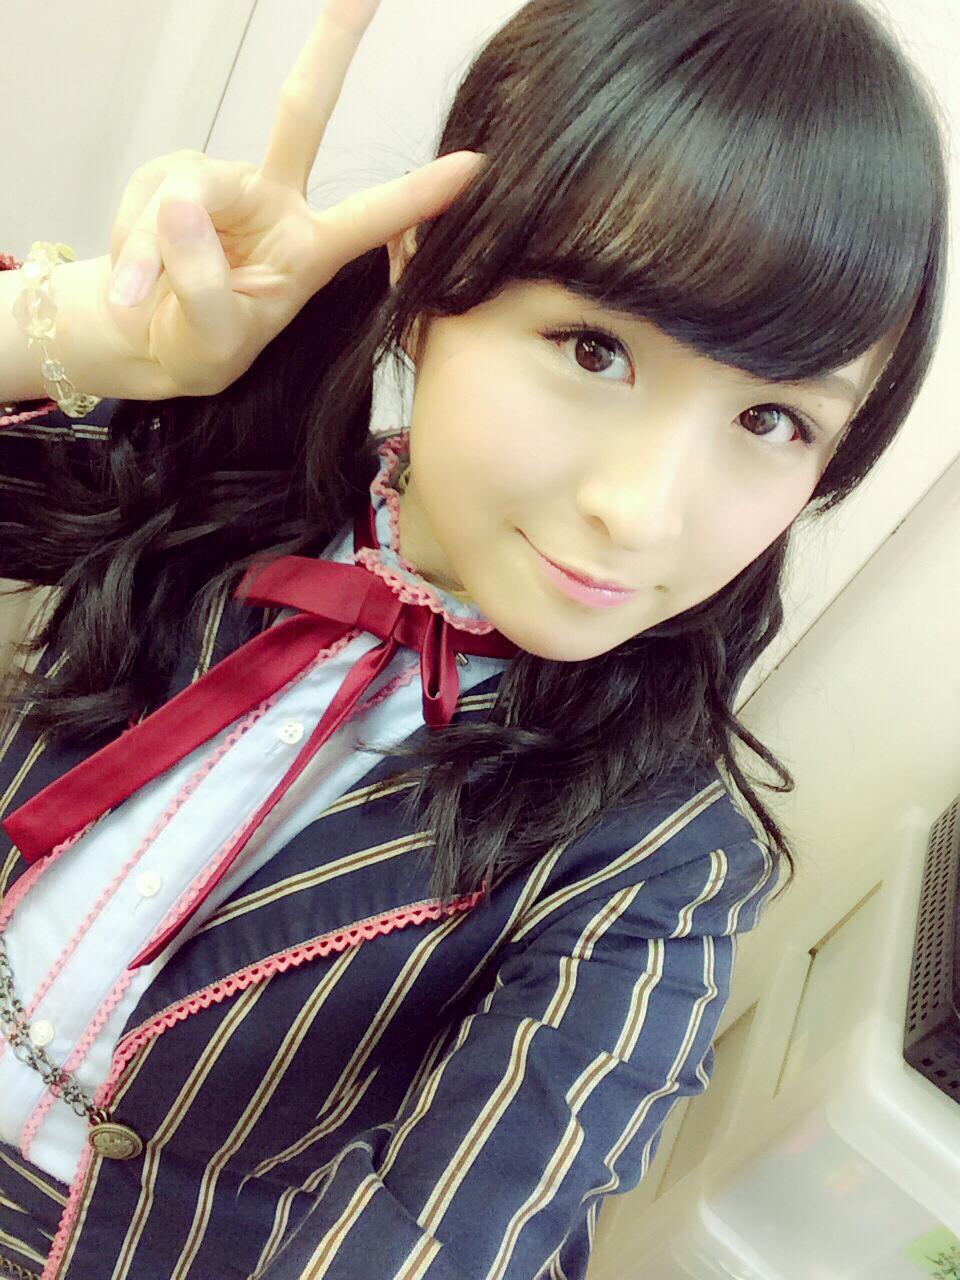 【AKB48】川本紗矢応援スレ★11【さやや】©2ch.net YouTube動画>16本 dailymotion>1本 ->画像>861枚